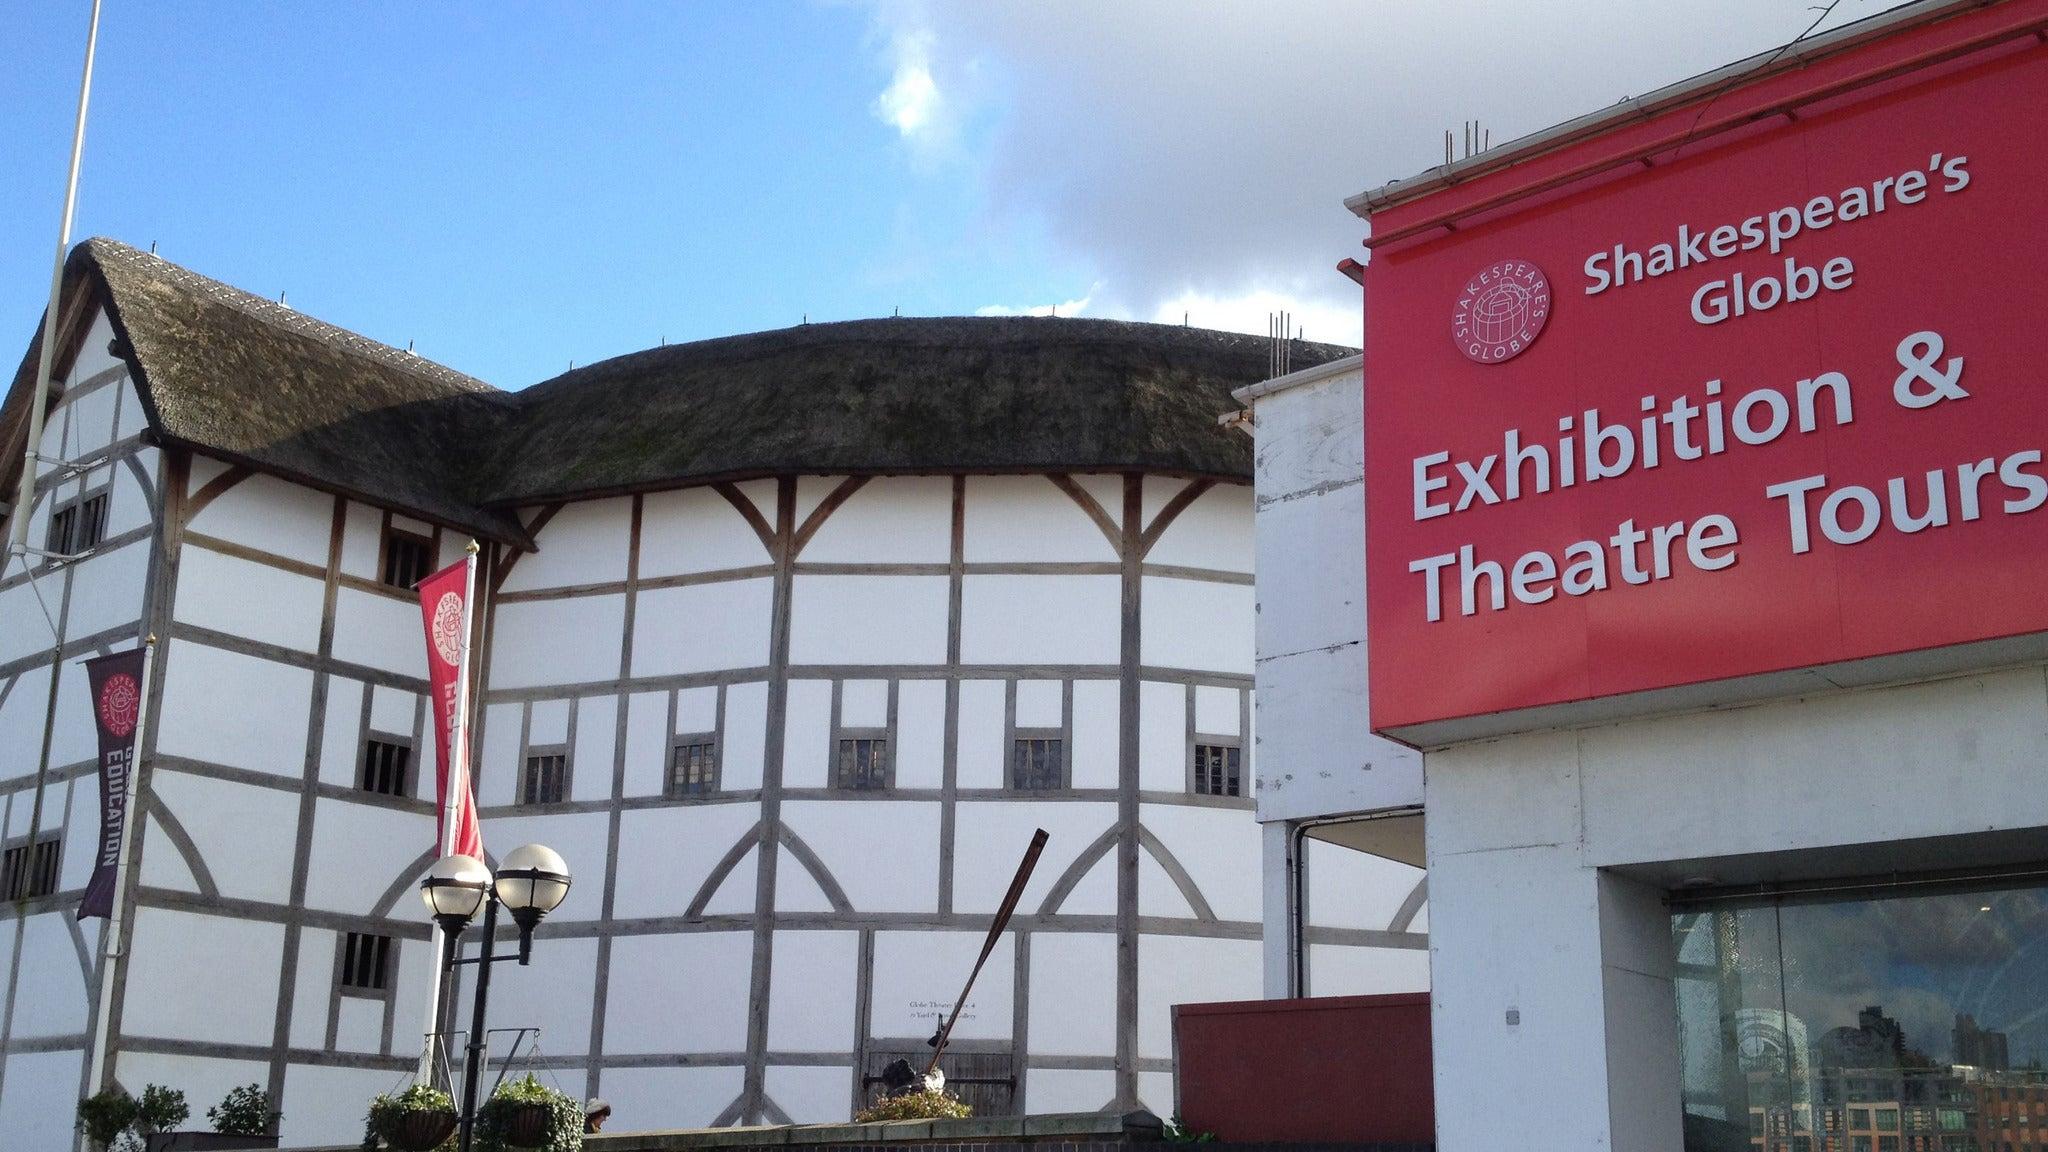 Shakespeare's Globe Theatre Tours